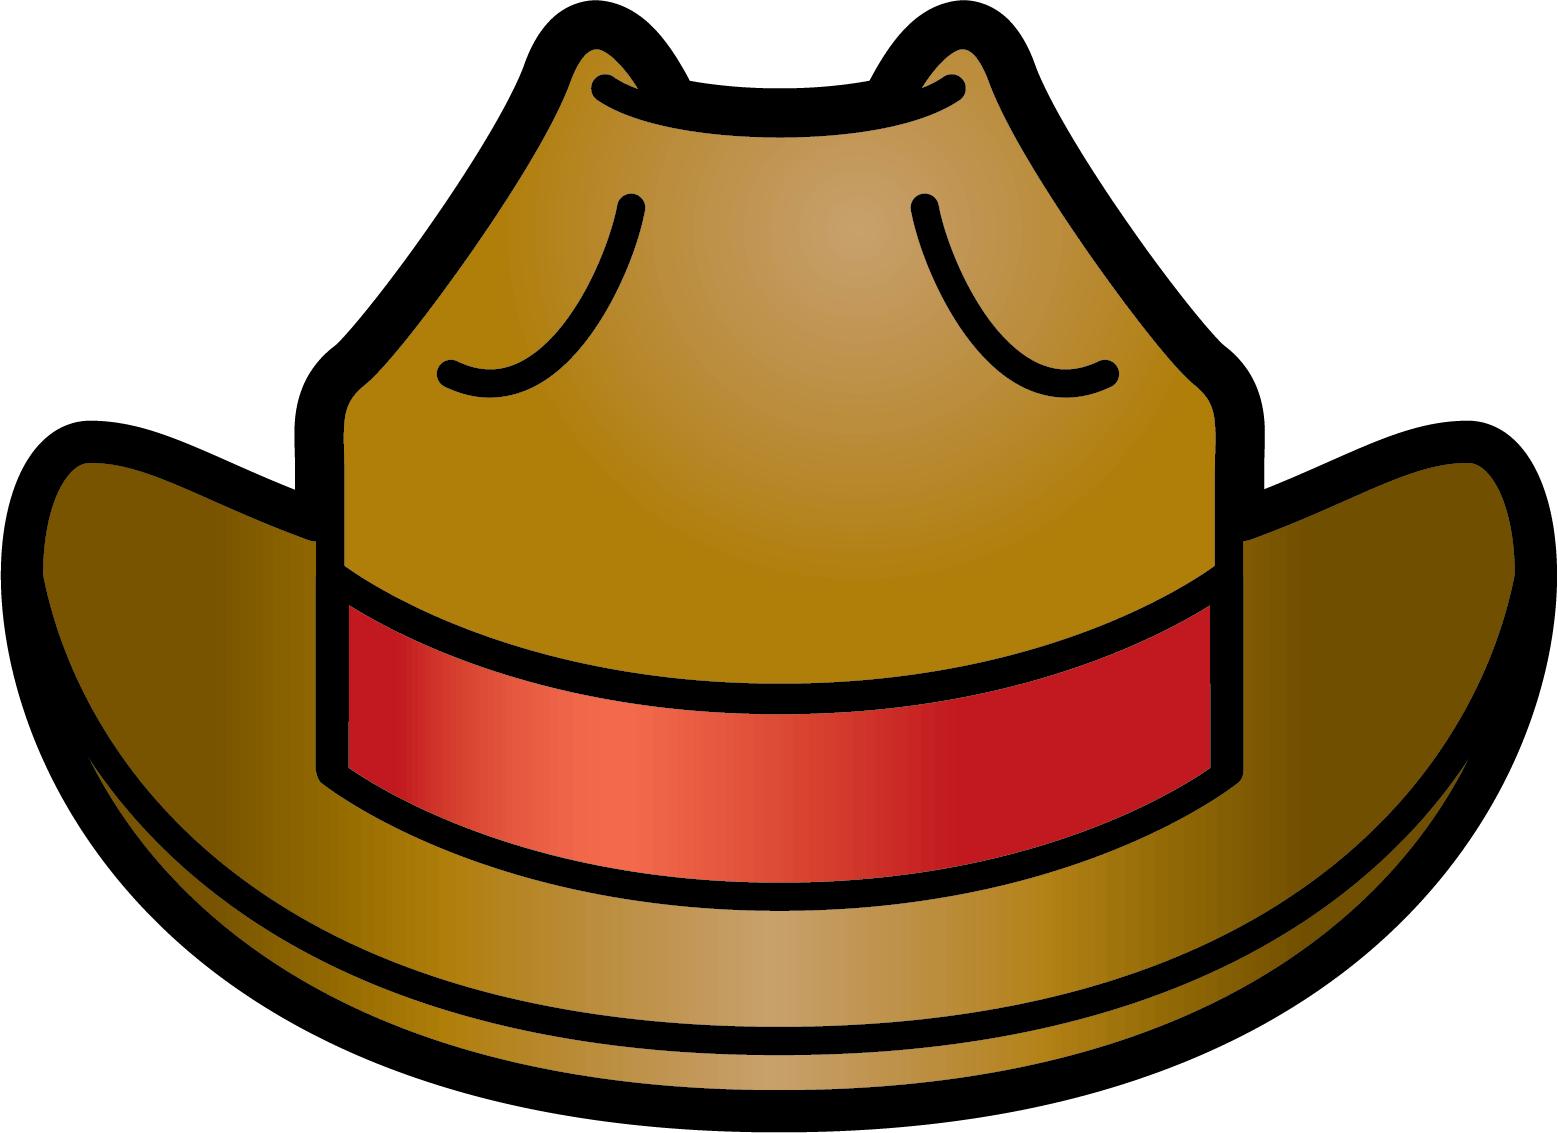 Hats Clipart.